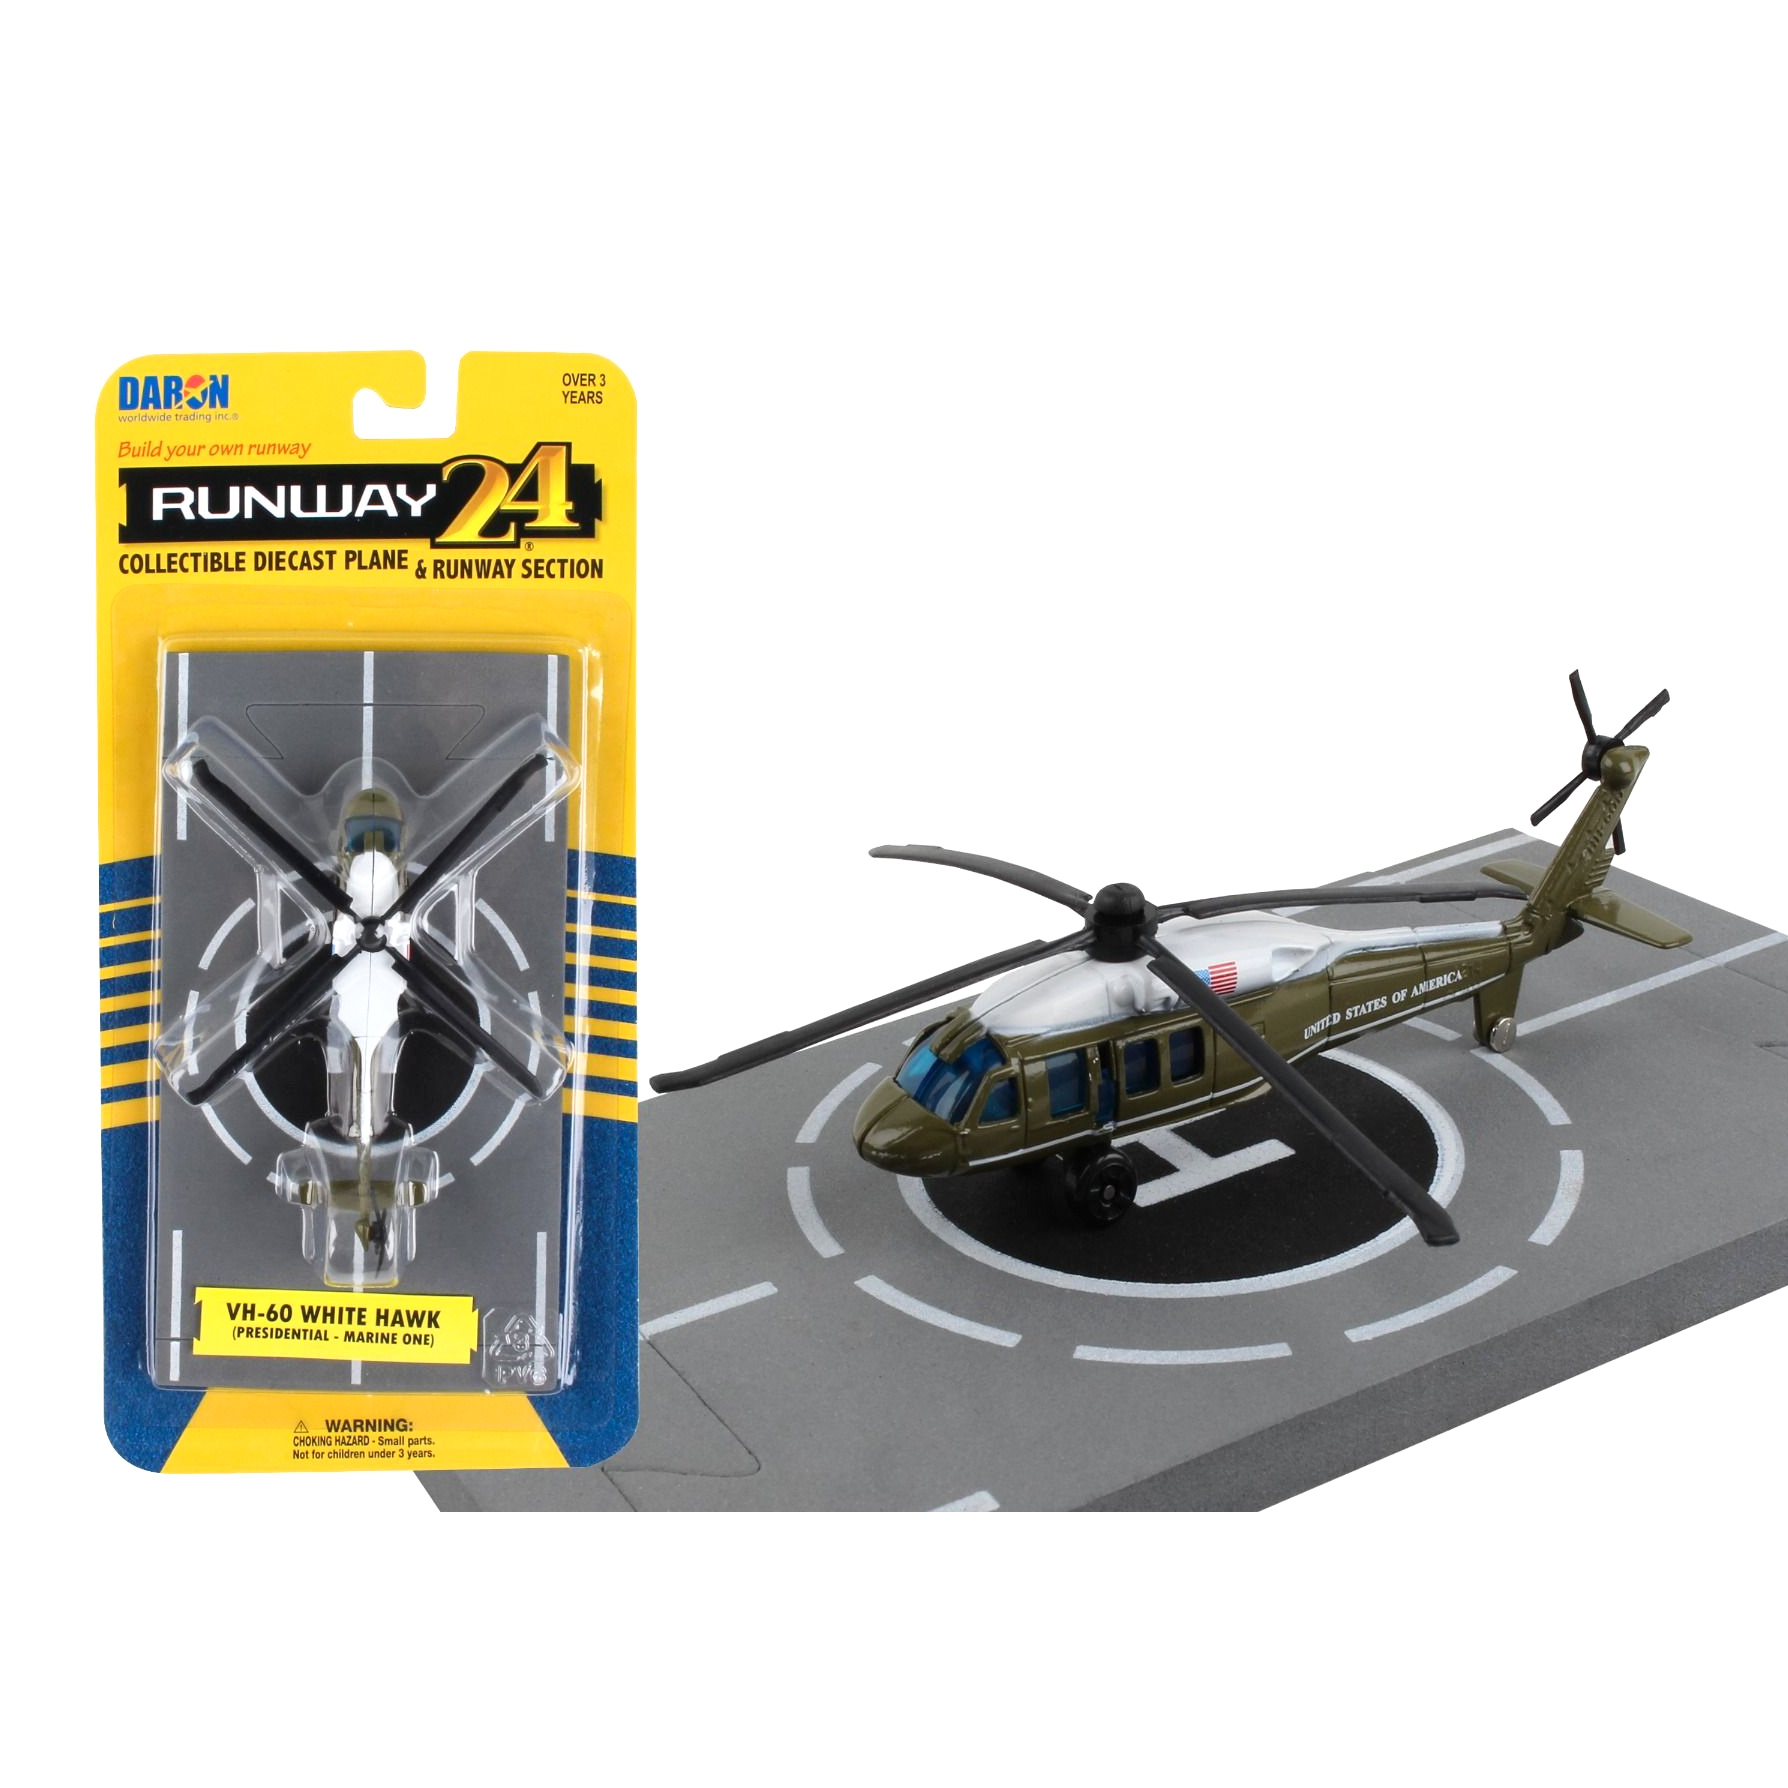 DARON/ダロン UH-60 大統領専用ヘリ